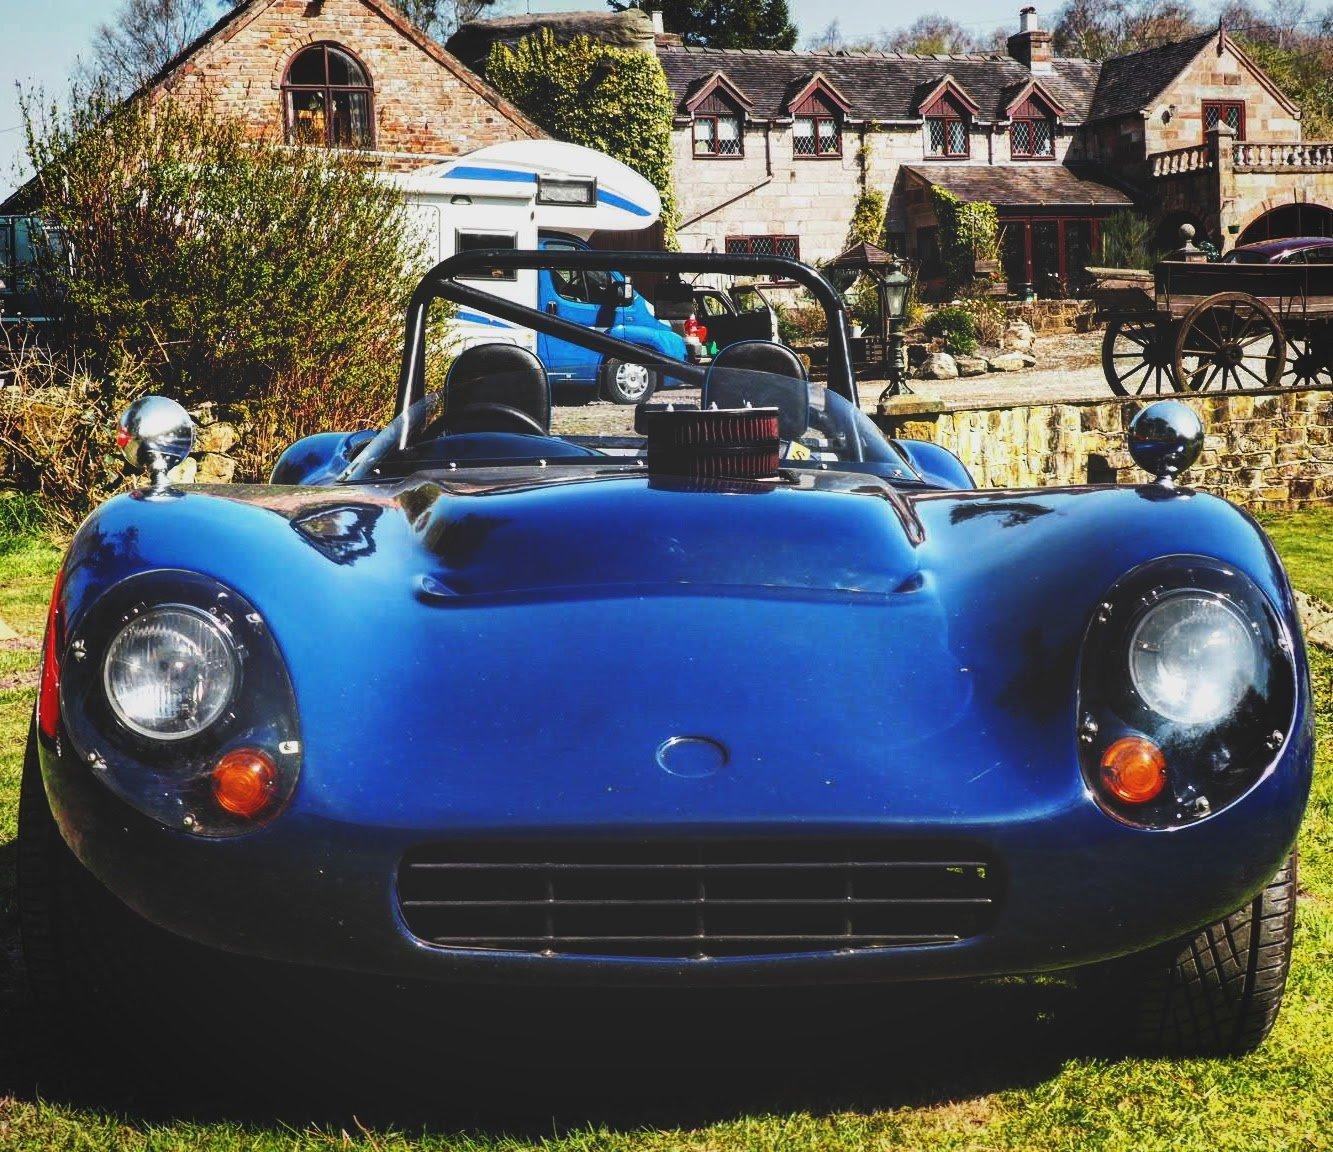 2001 Stuart taylor phoenix Track & Kit Car For Sale (picture 5 of 6)